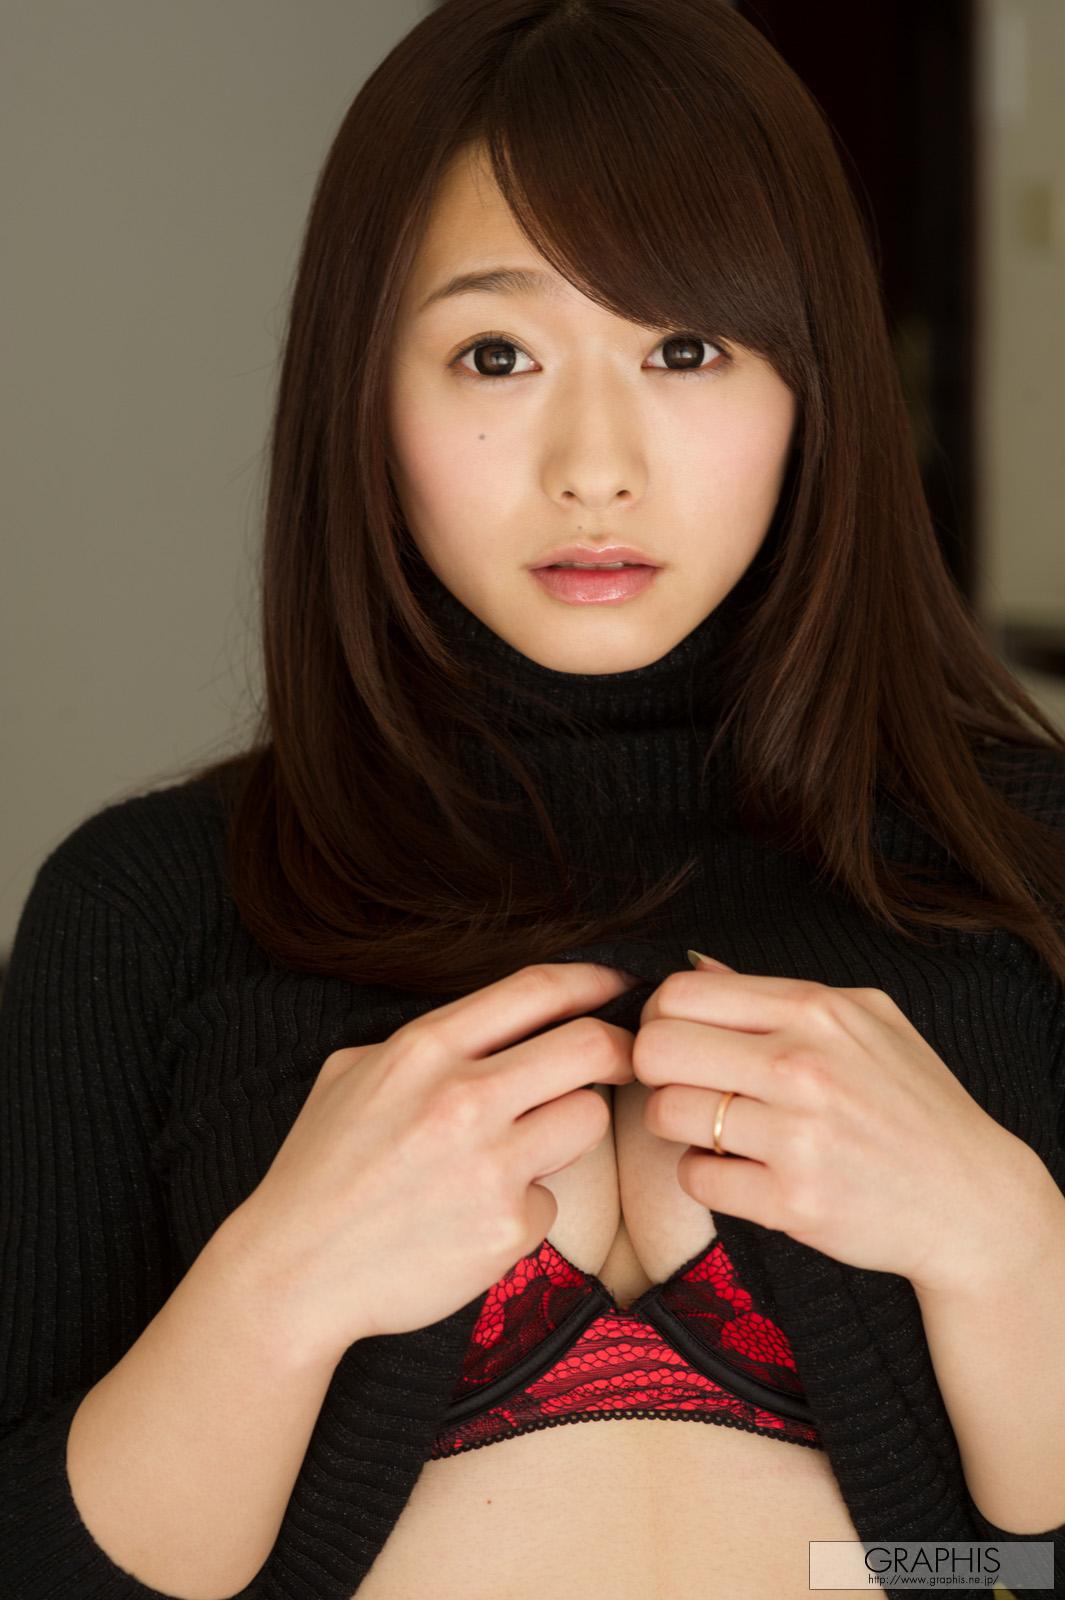 marina-shiraishi-japanese-busty-asian-girl-nude-graphis-09